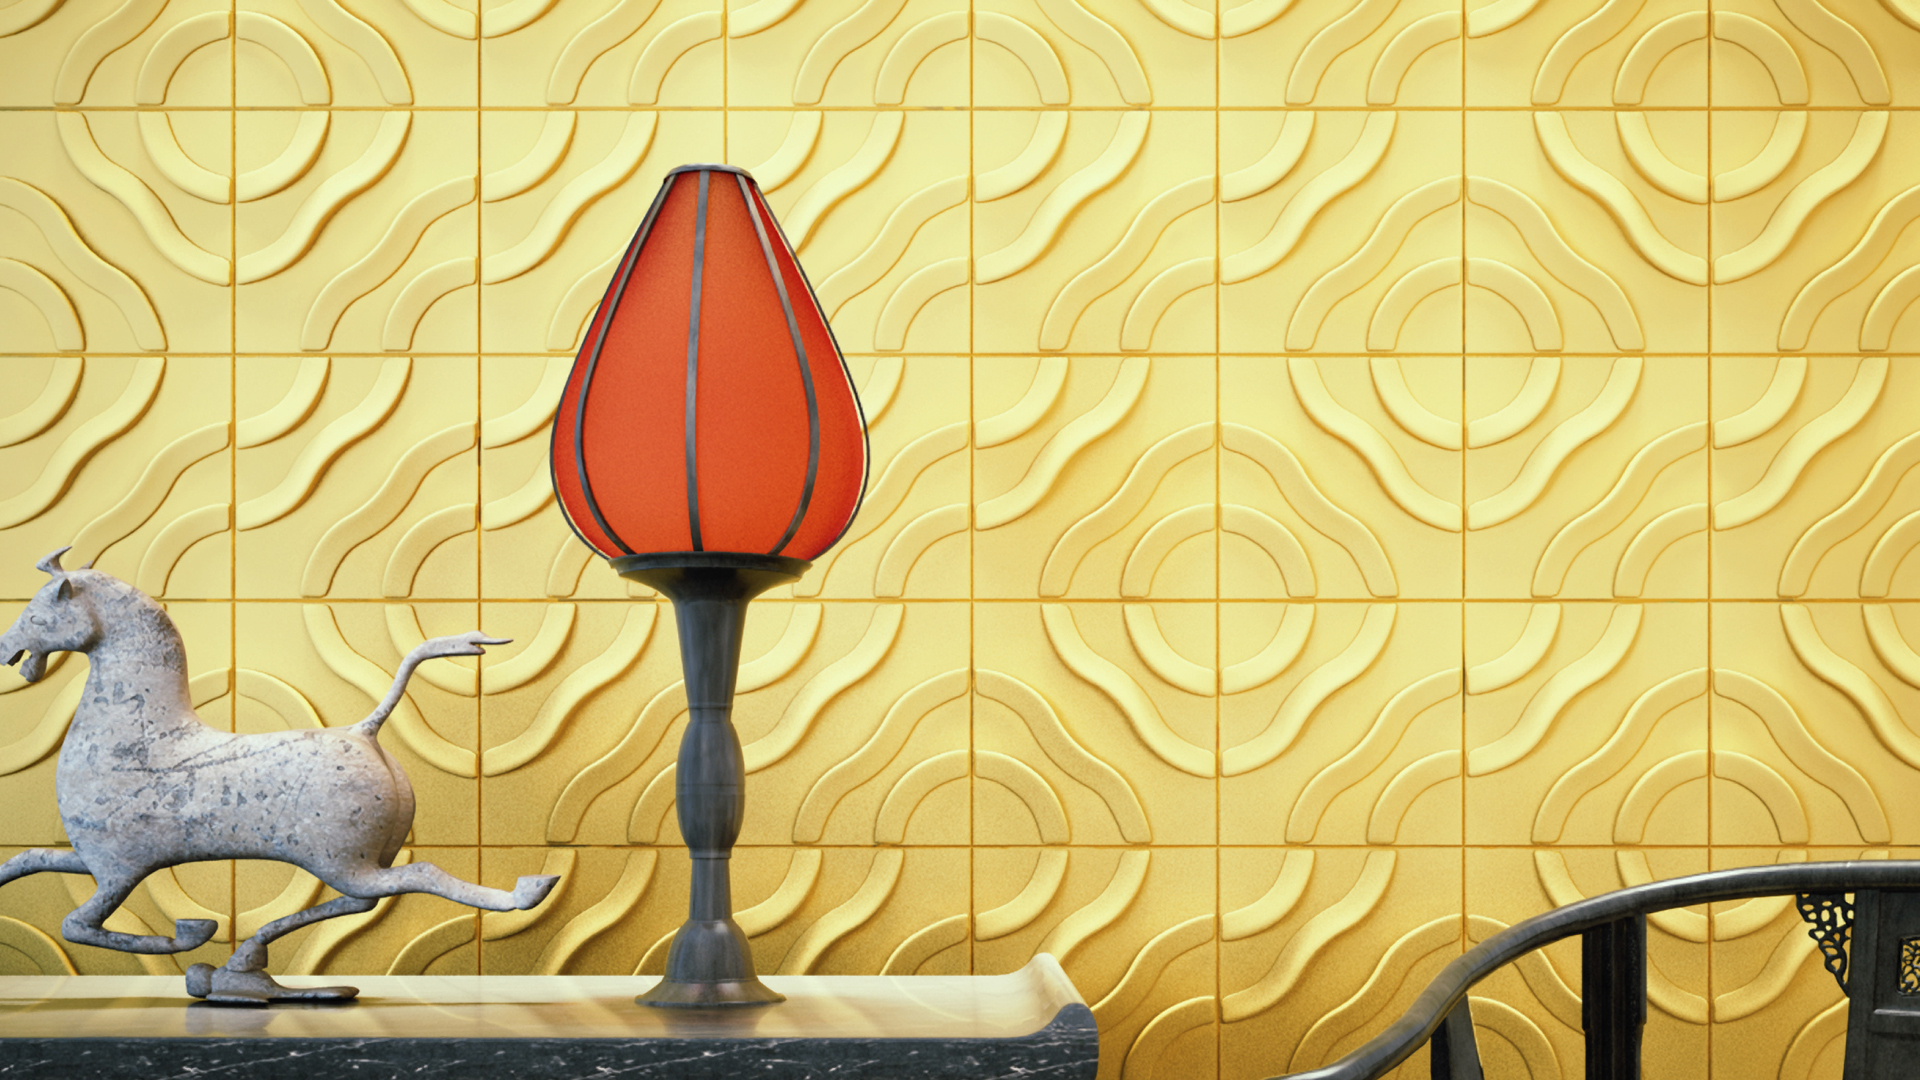 3D Wandpaneele - Produkte - Sailing - Deckenpaneele - 3D Tapeten - Wandverkleidung